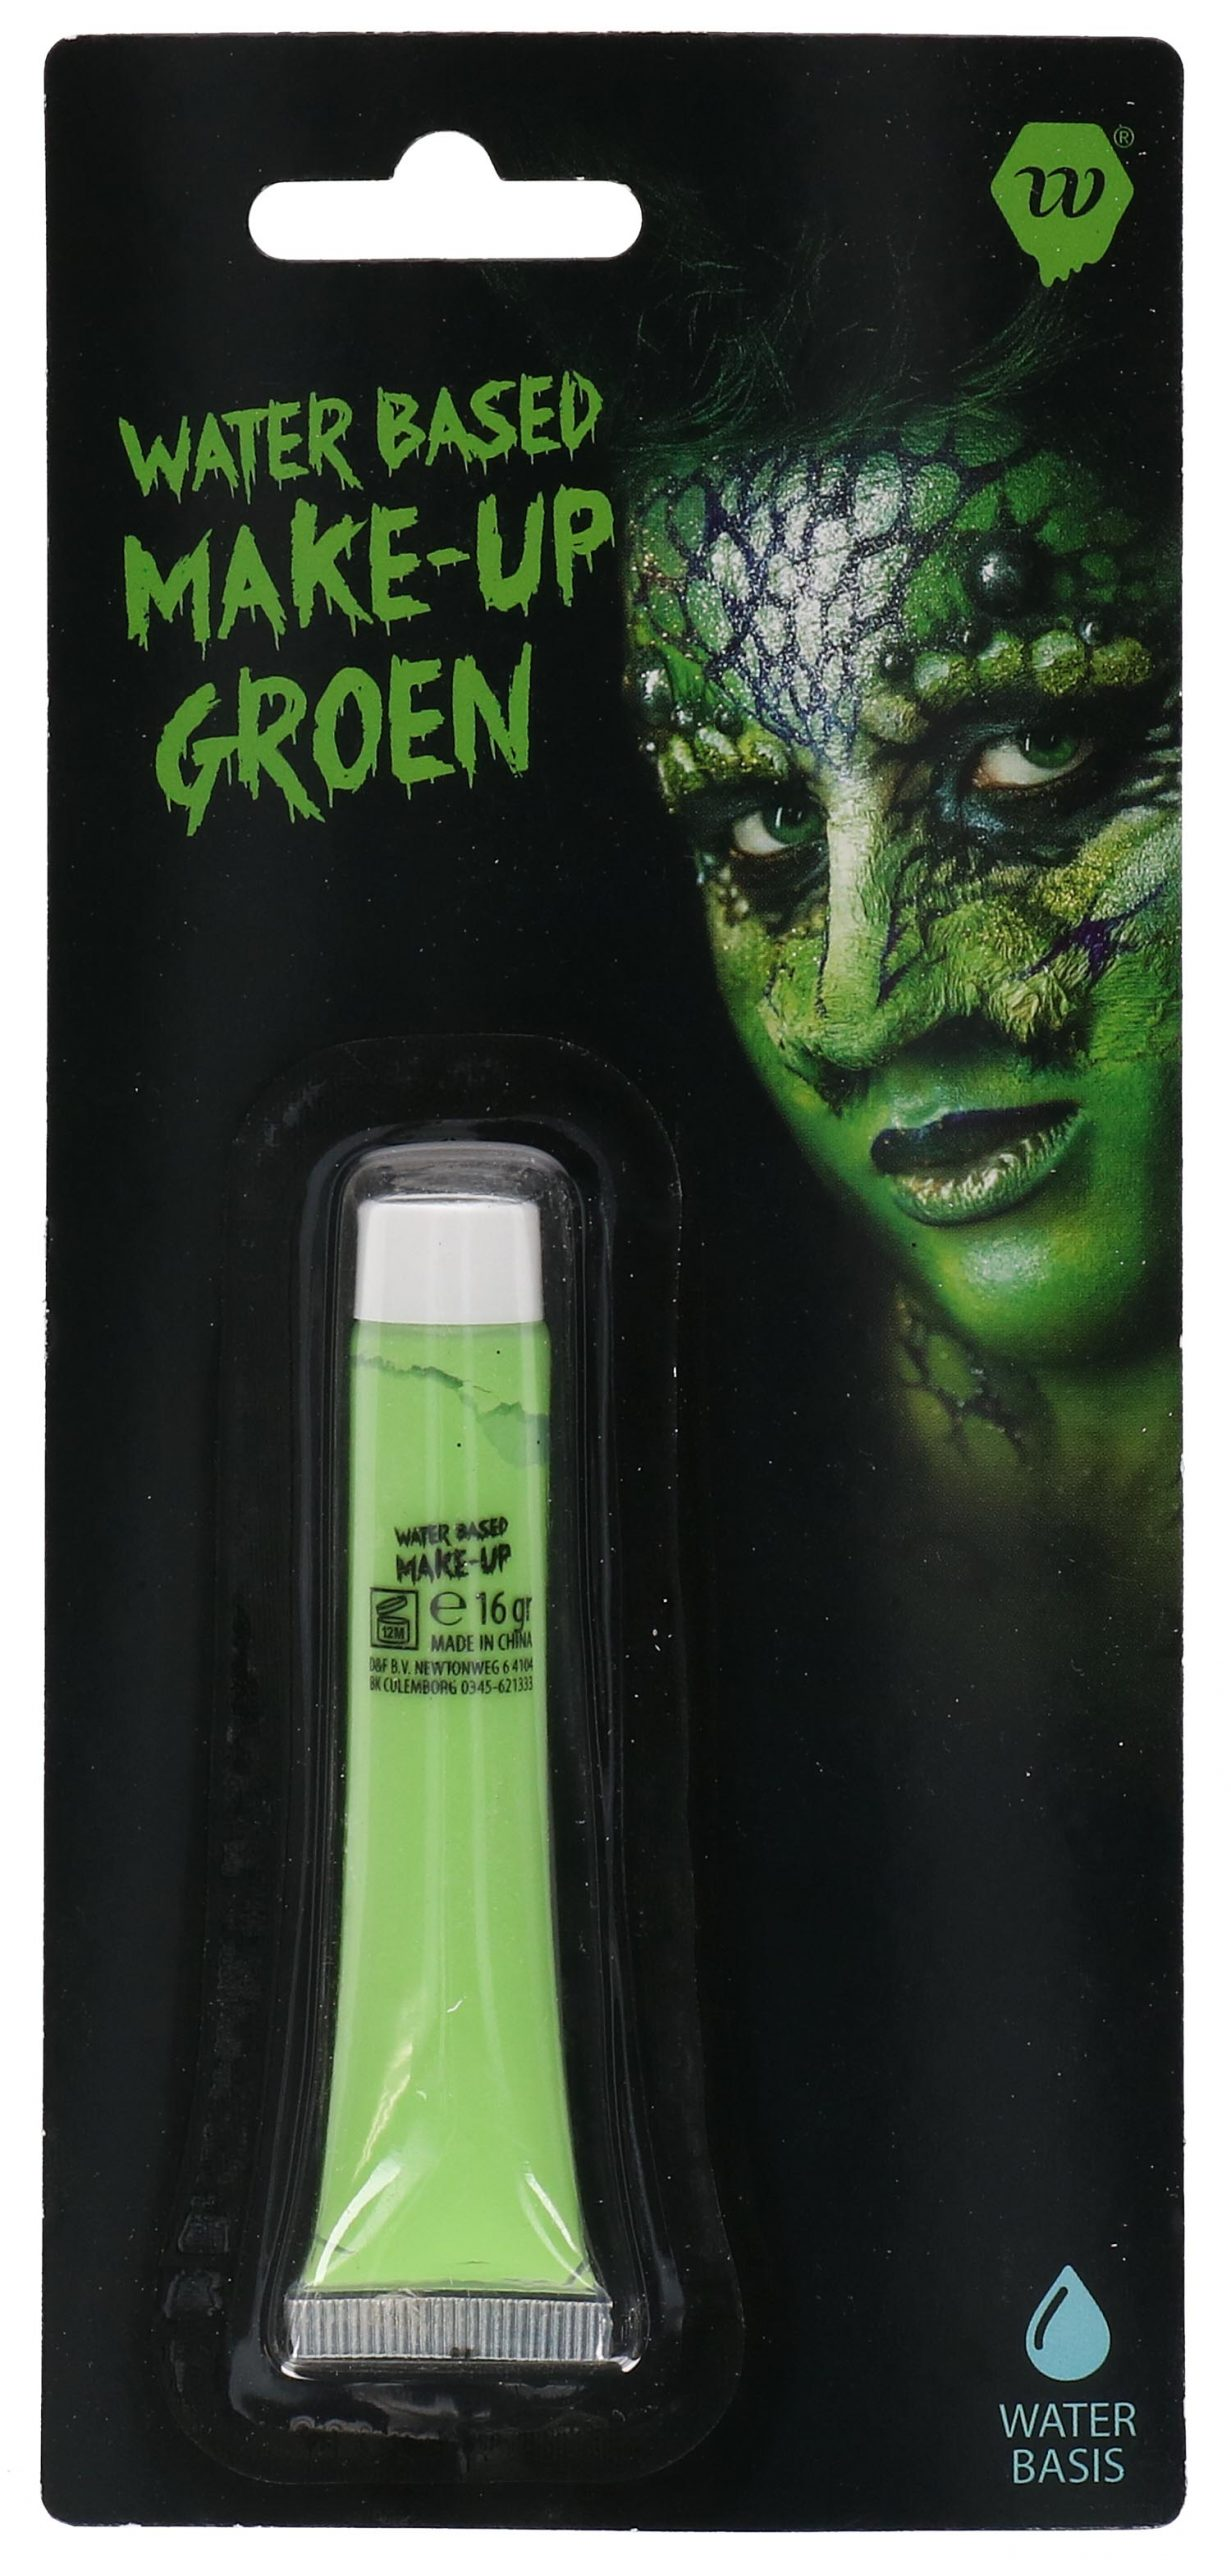 Water-Based Make-up Groen Wauwfactor